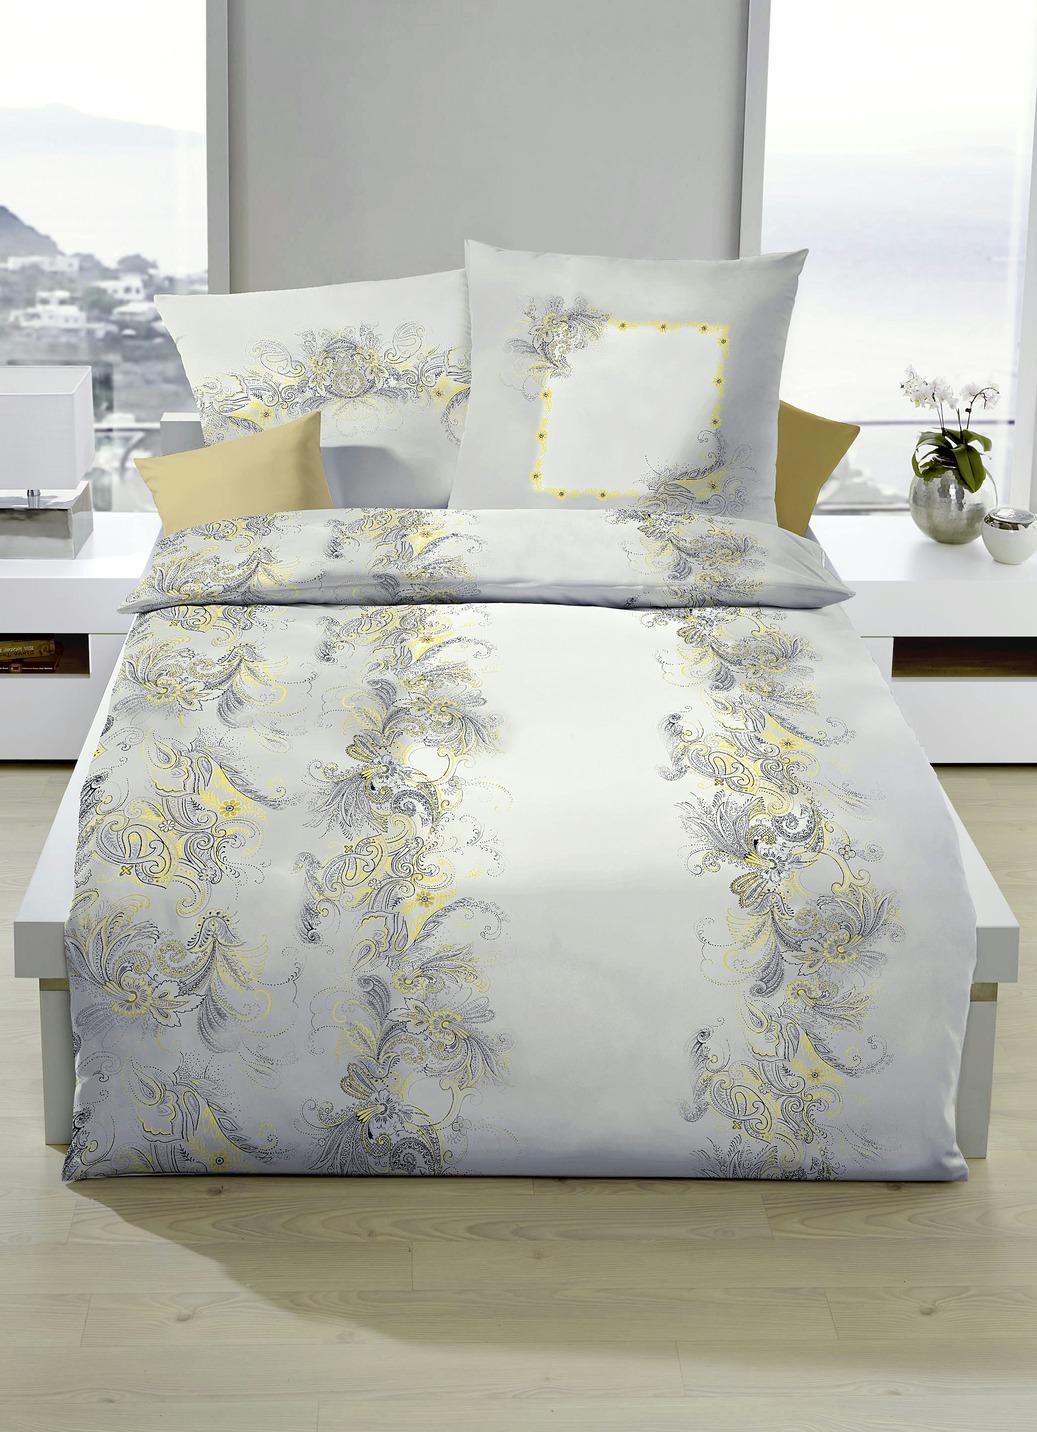 elfi b bettw sche garnitur in verschiedenen qualit ten. Black Bedroom Furniture Sets. Home Design Ideas